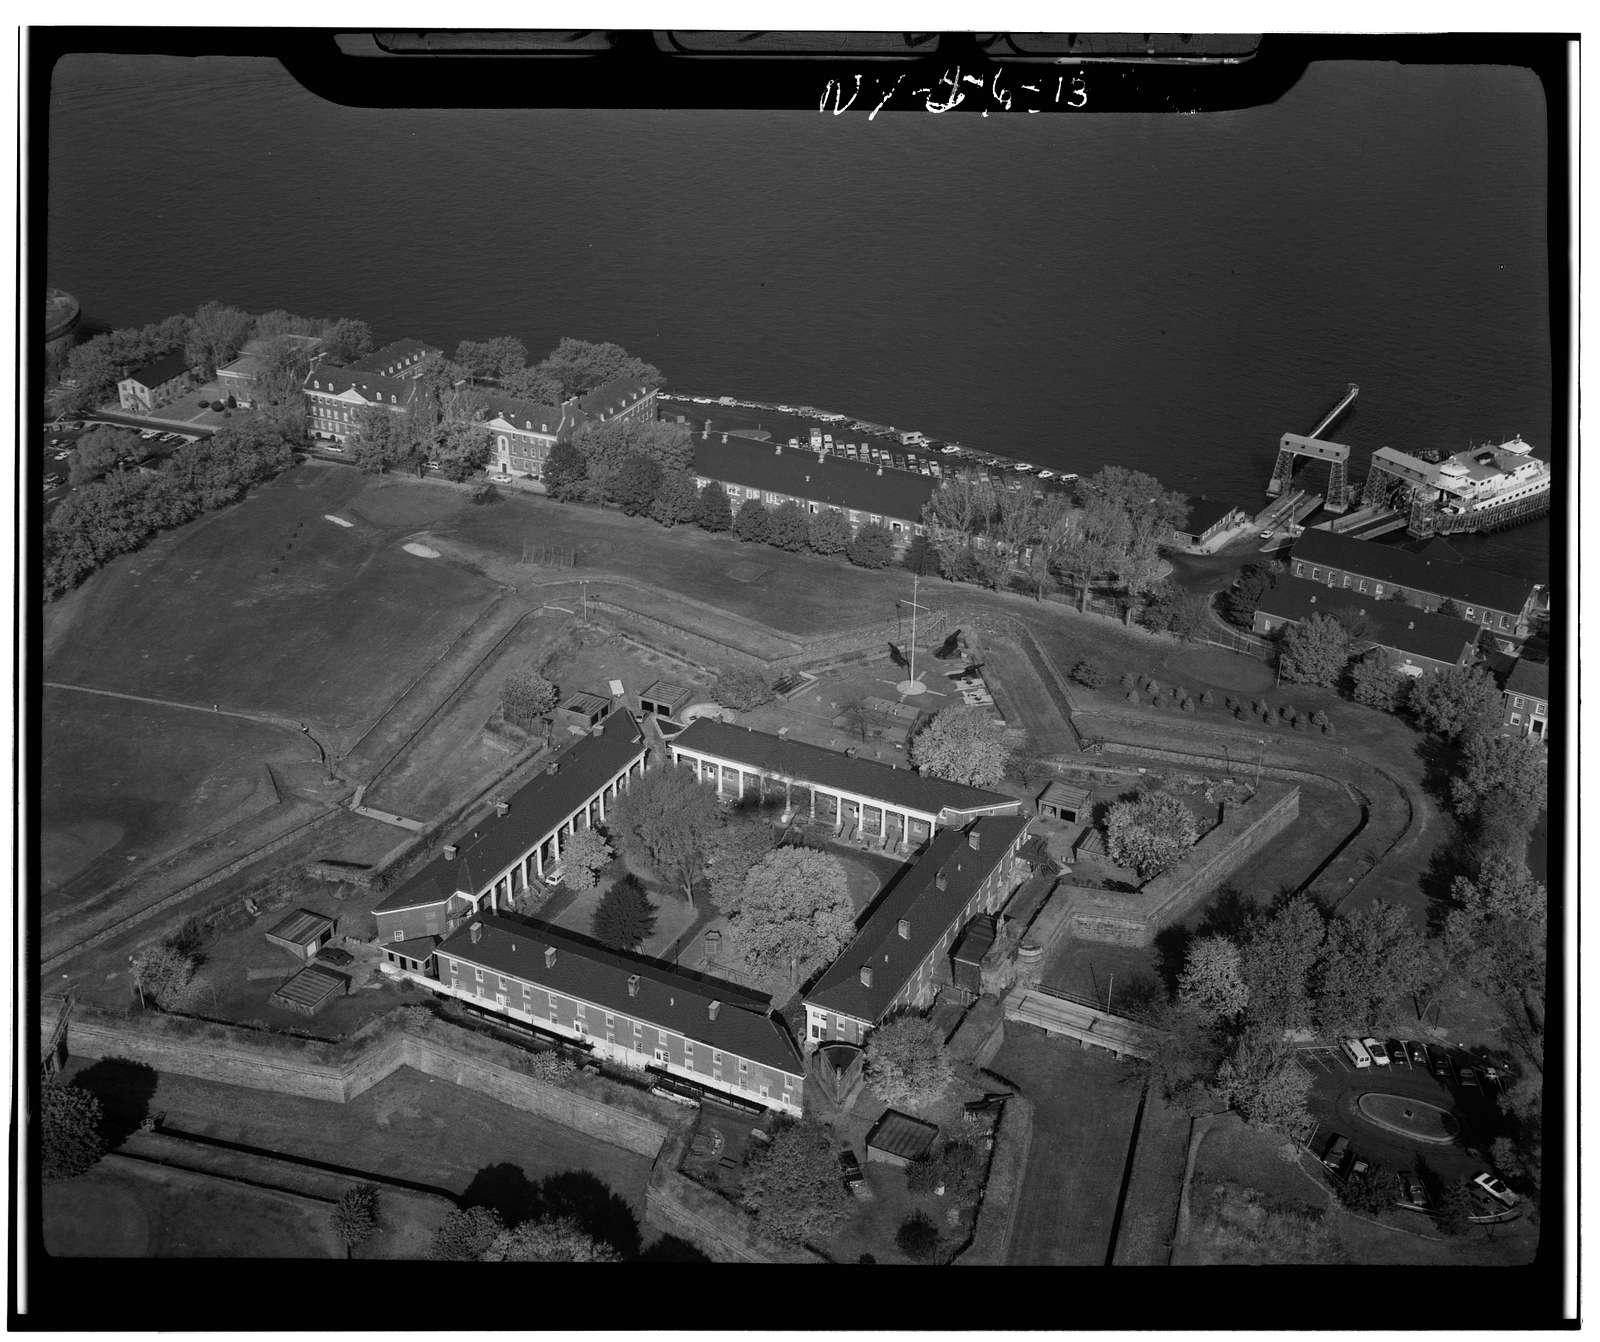 Governors Island, Fort Columbus, New York Harbor, New York, New York County, NY